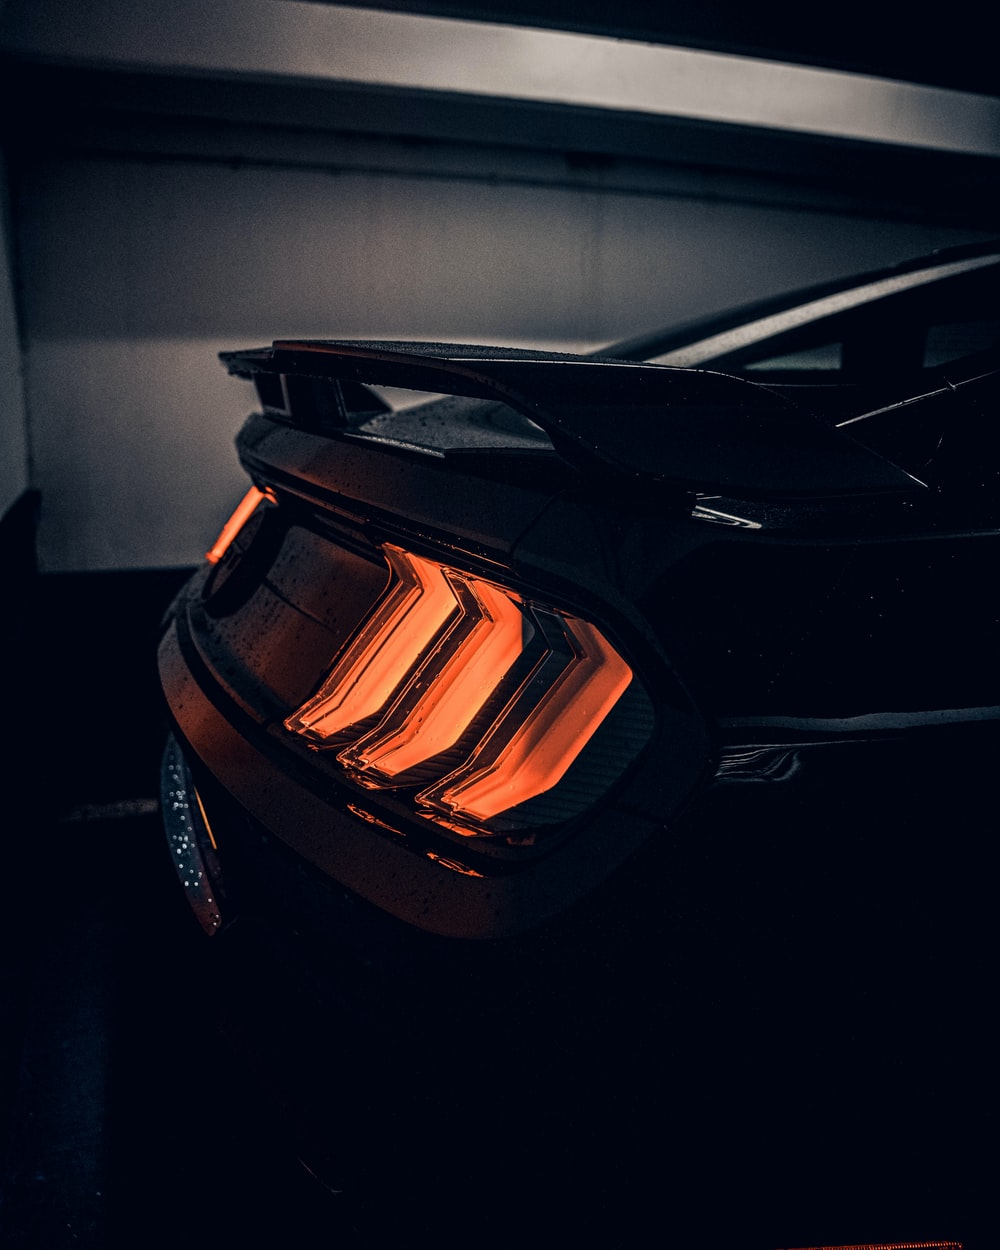 black car in a dark room